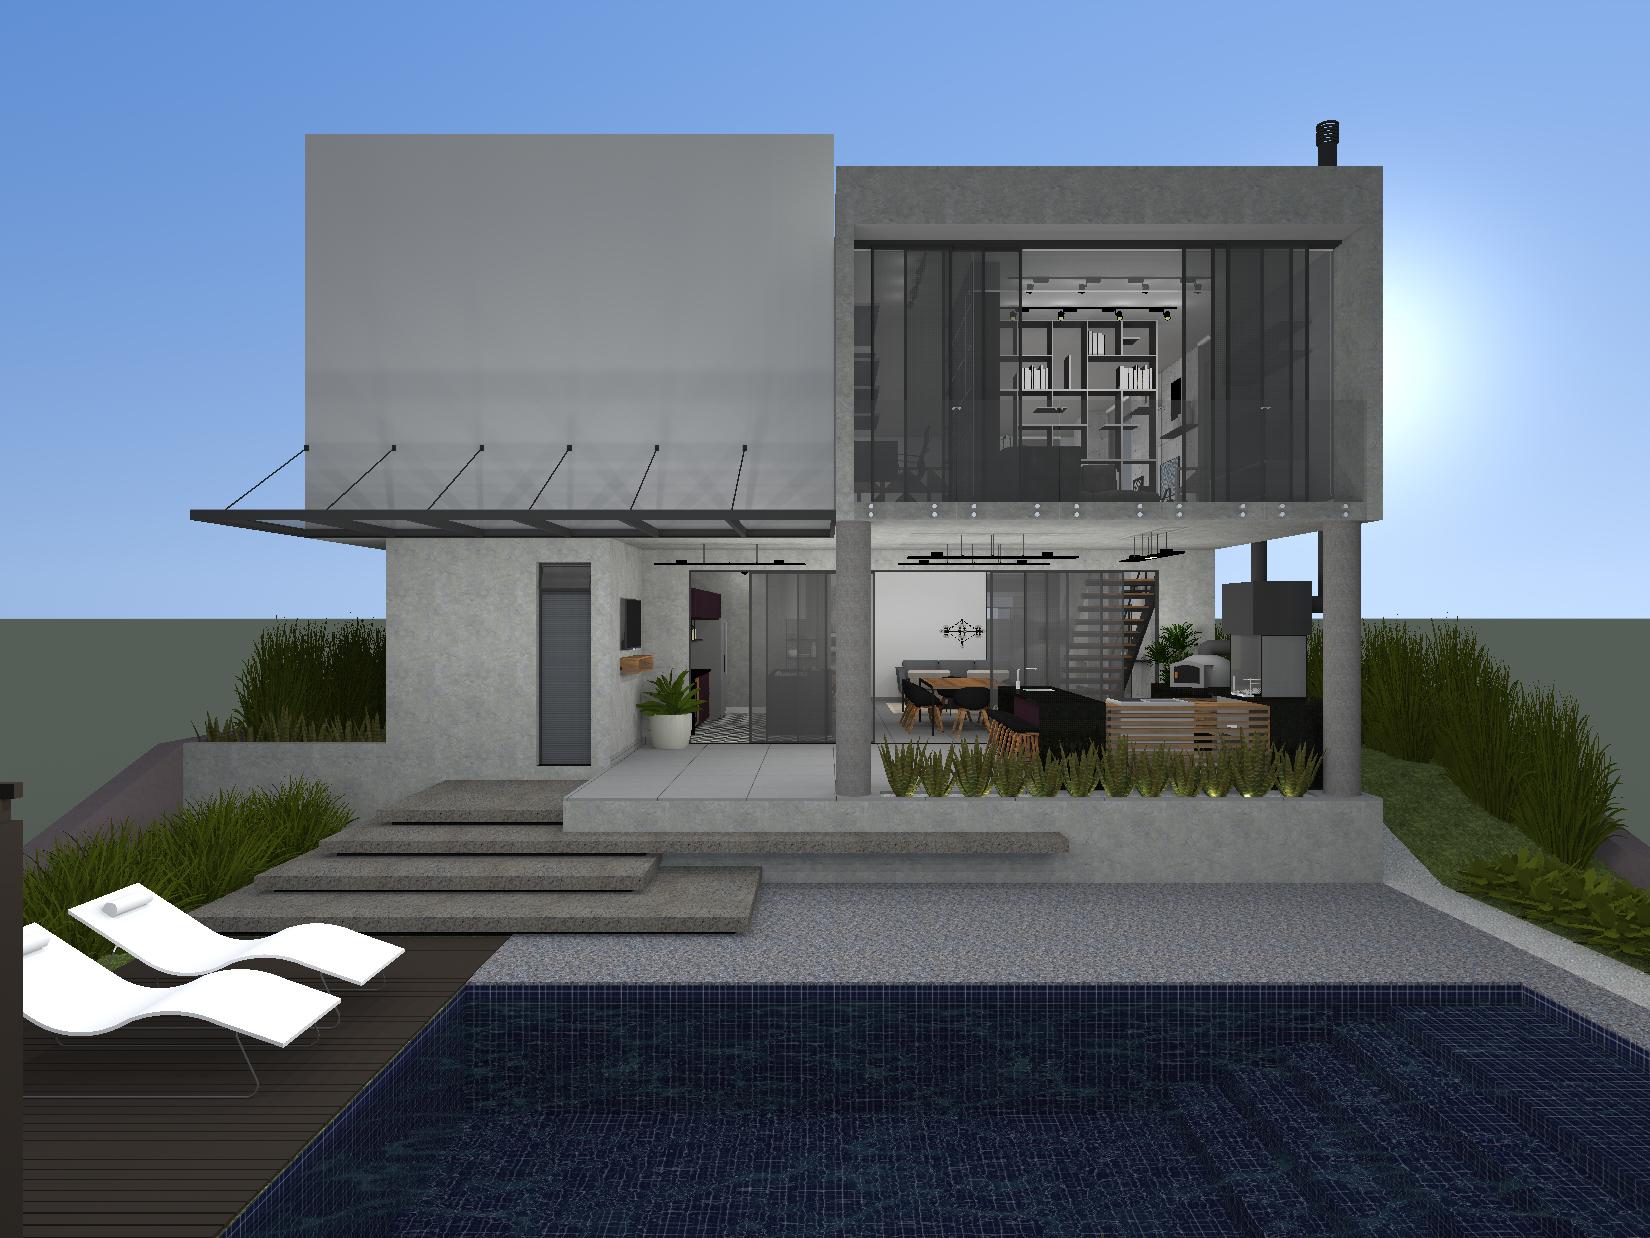 Residencial Bomk